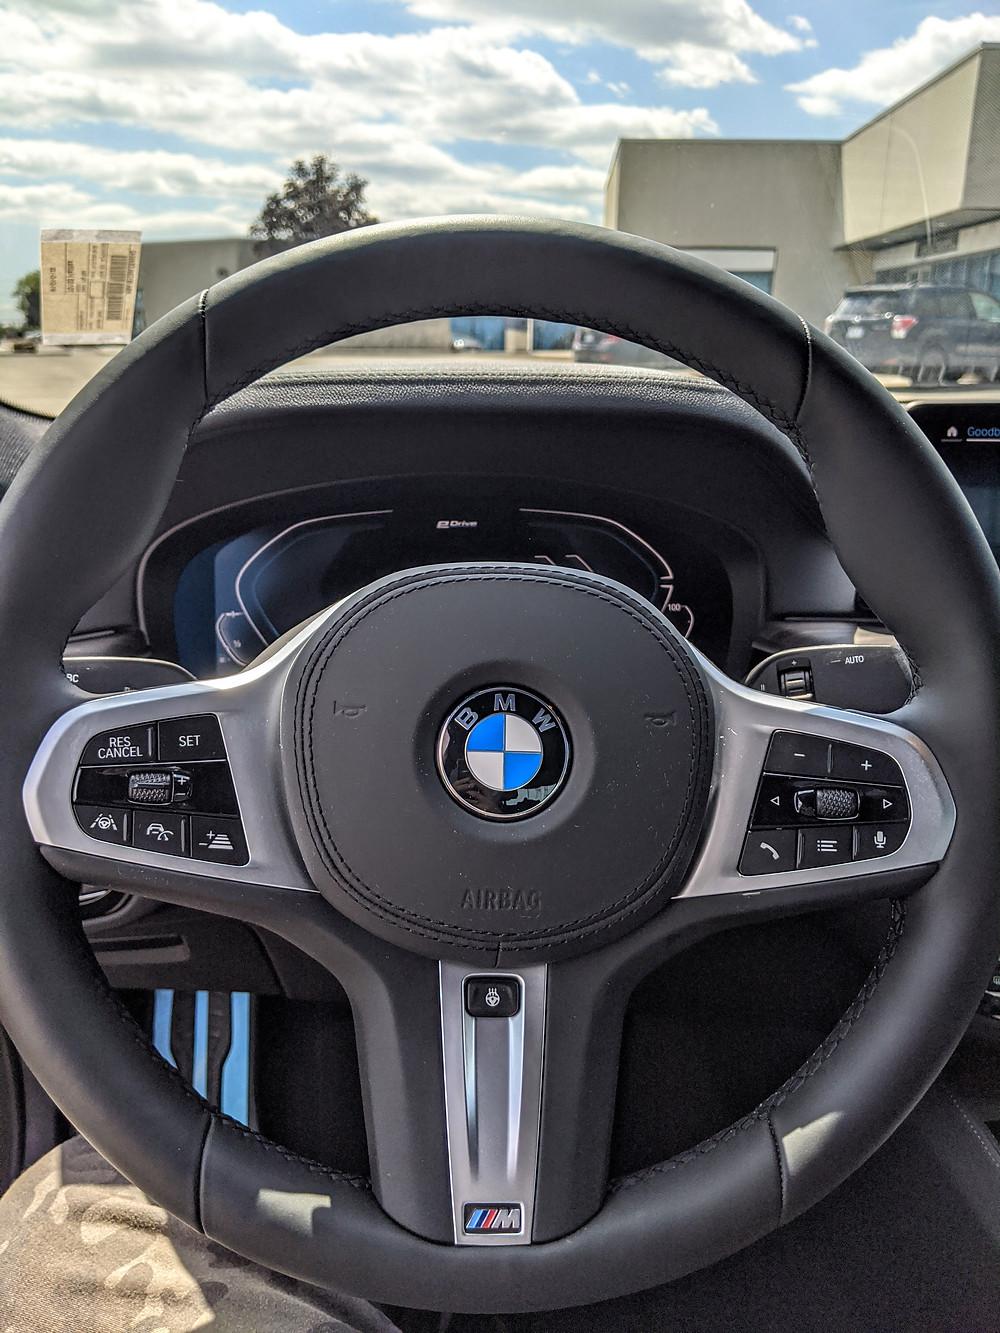 2020 BMW 530e Steering Wheel